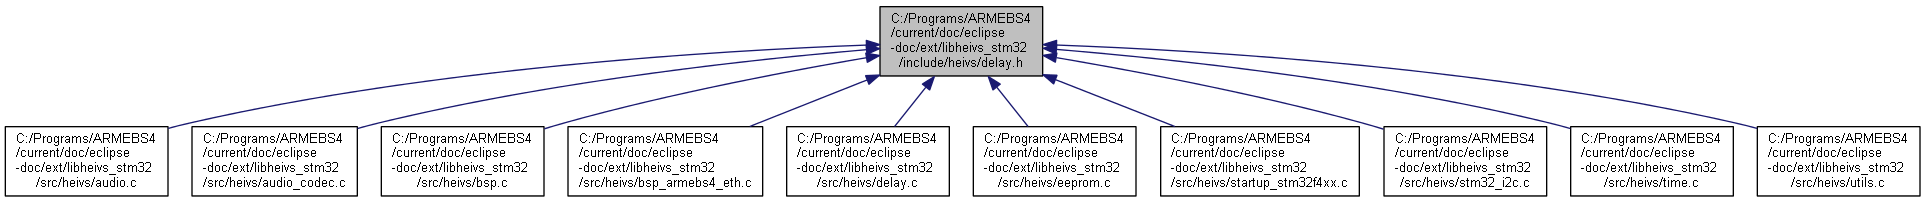 ARMEBS4: C:/Programs/ARMEBS4/current/doc/eclipse-doc/ext